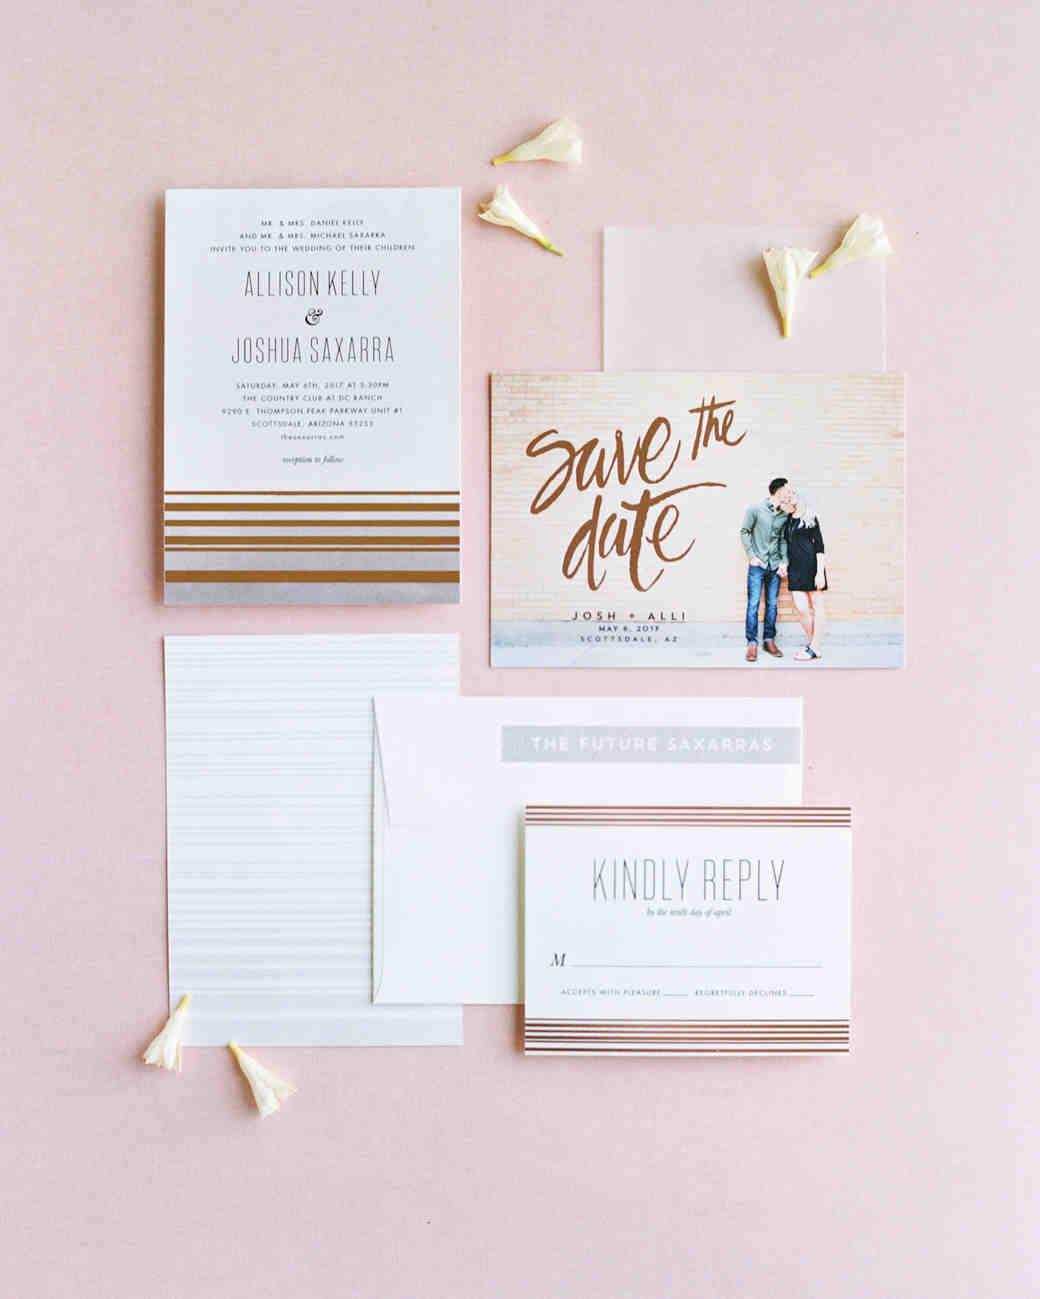 Unigue Wedding Invitations 034 - Unigue Wedding Invitations